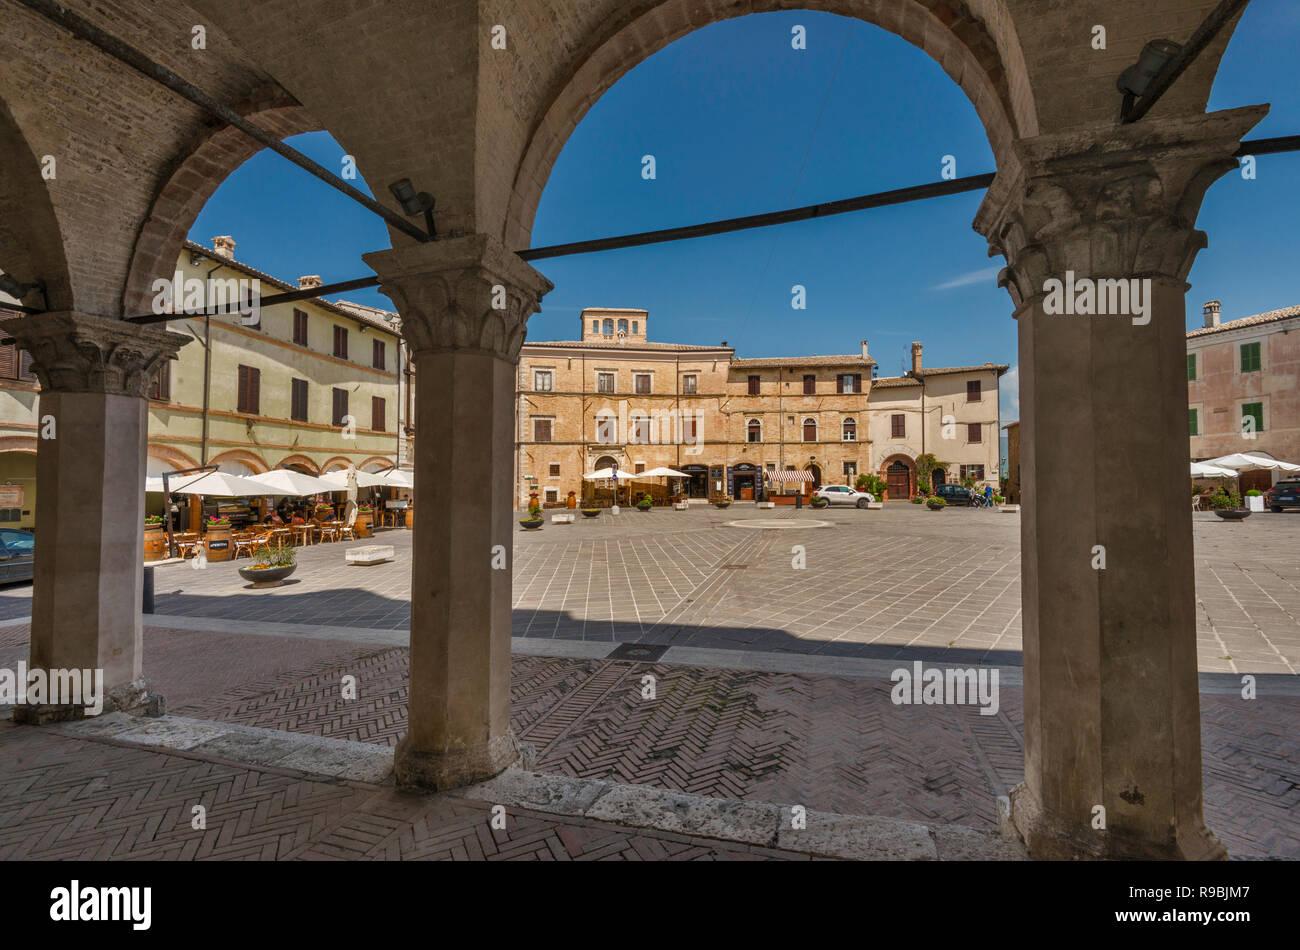 Piazza del Comune, arcades at Palazzo Comunale (Town Hall), in historic center of Montefalco, Umbria, Italy - Stock Image